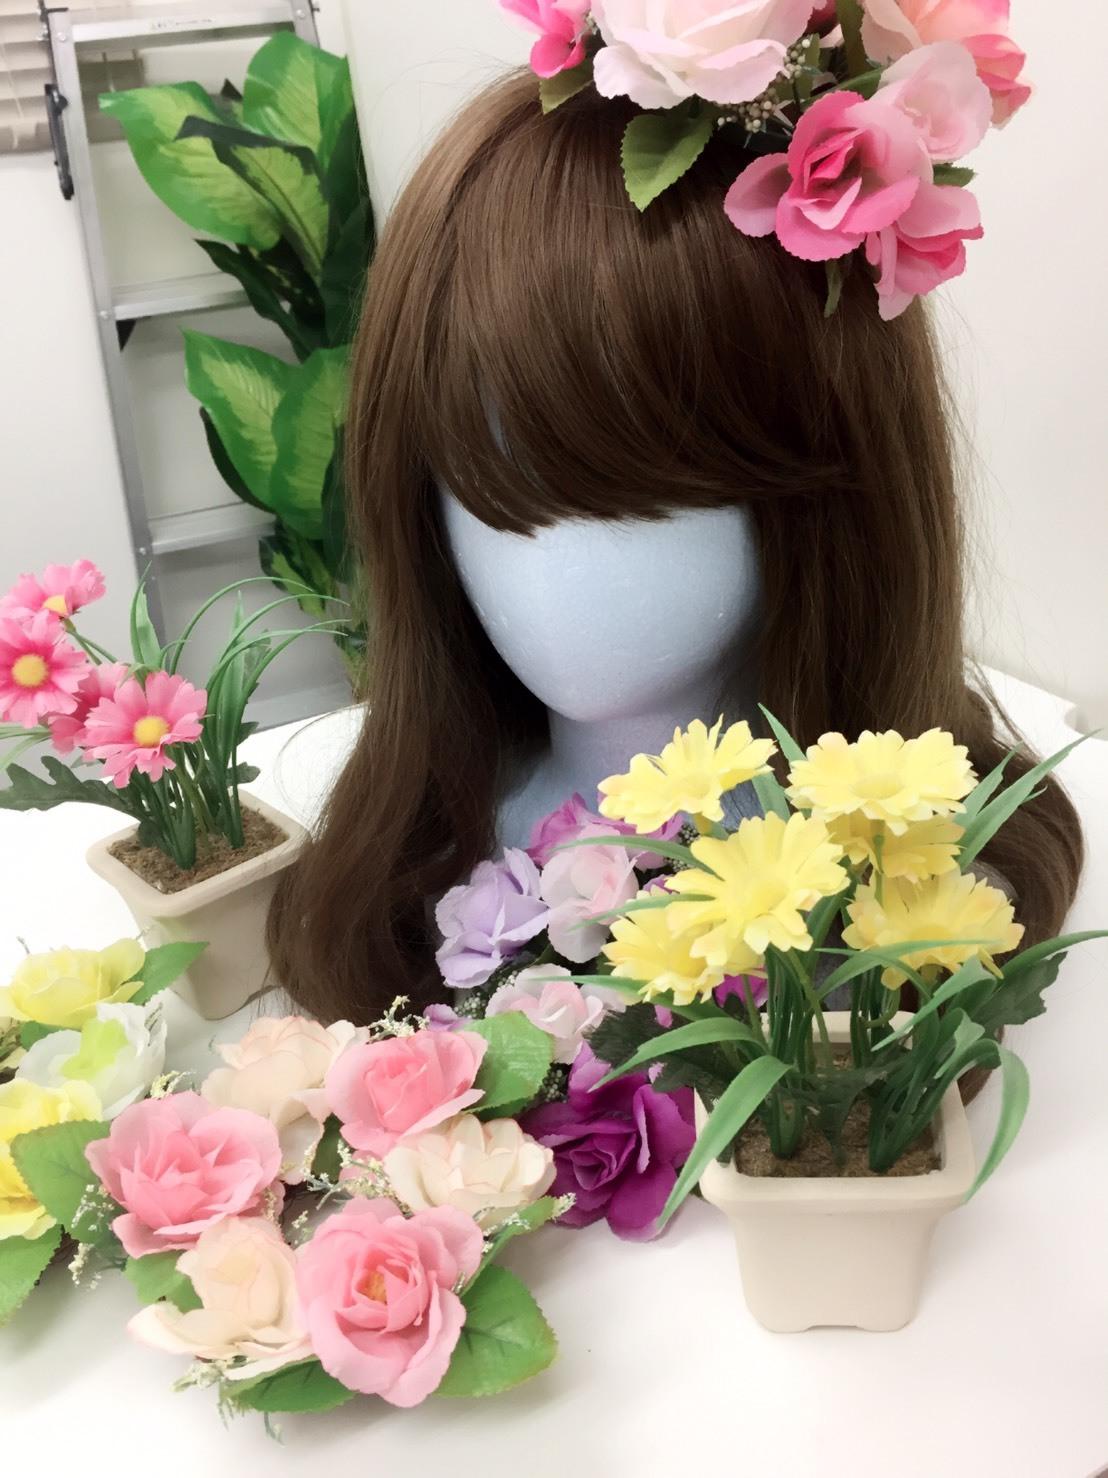 S__6185051.jpg